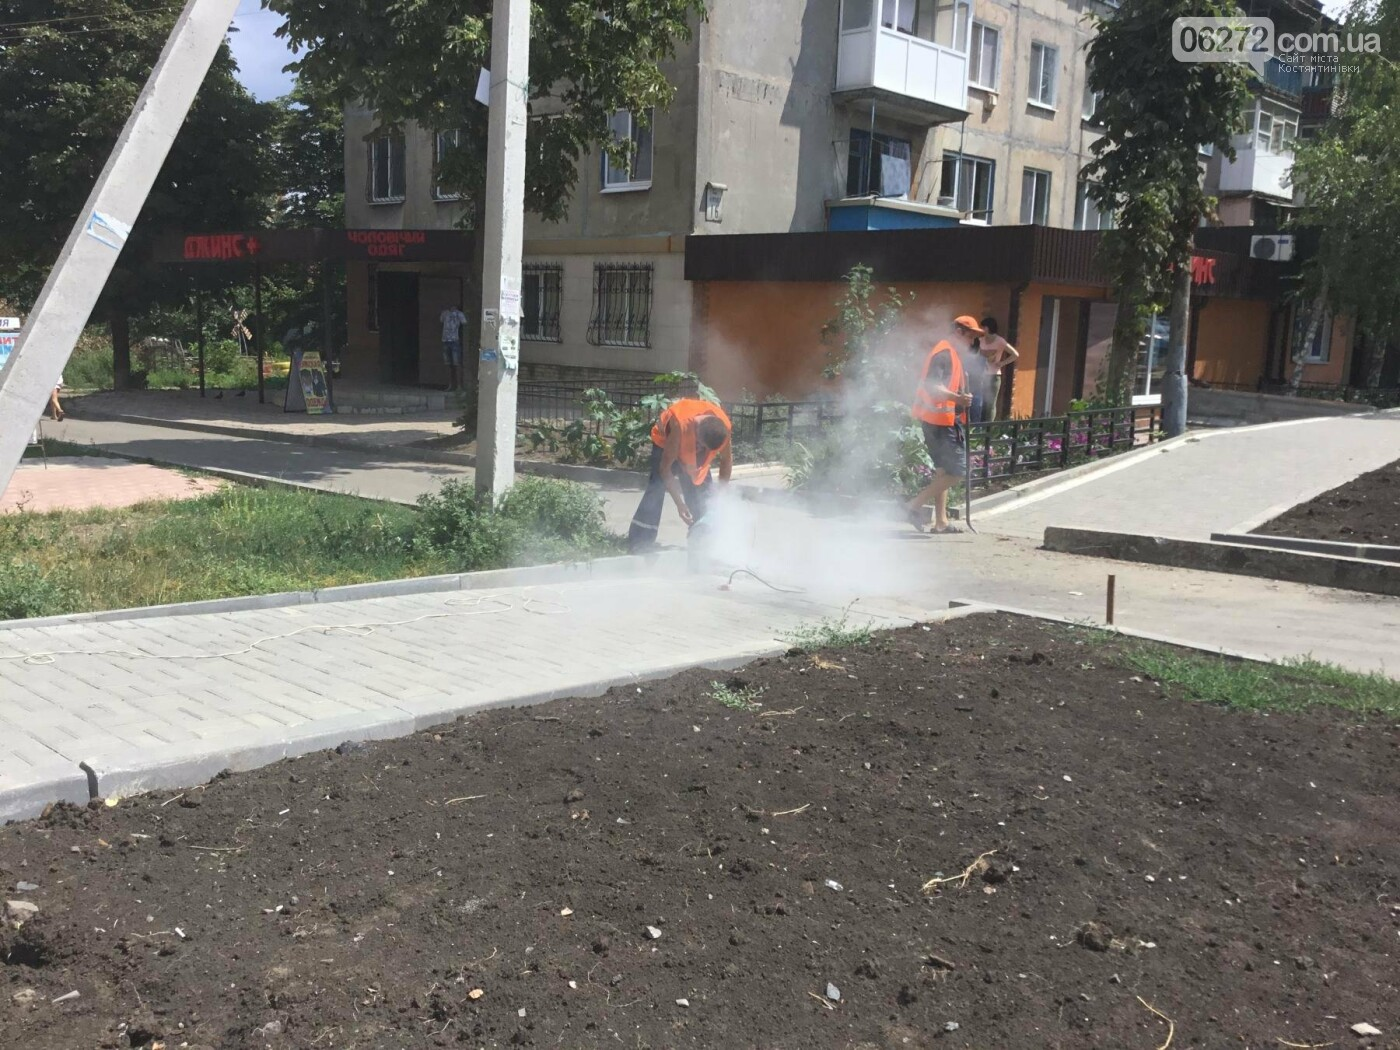 В Константиновке продолжают ремонт дорог, фото-11